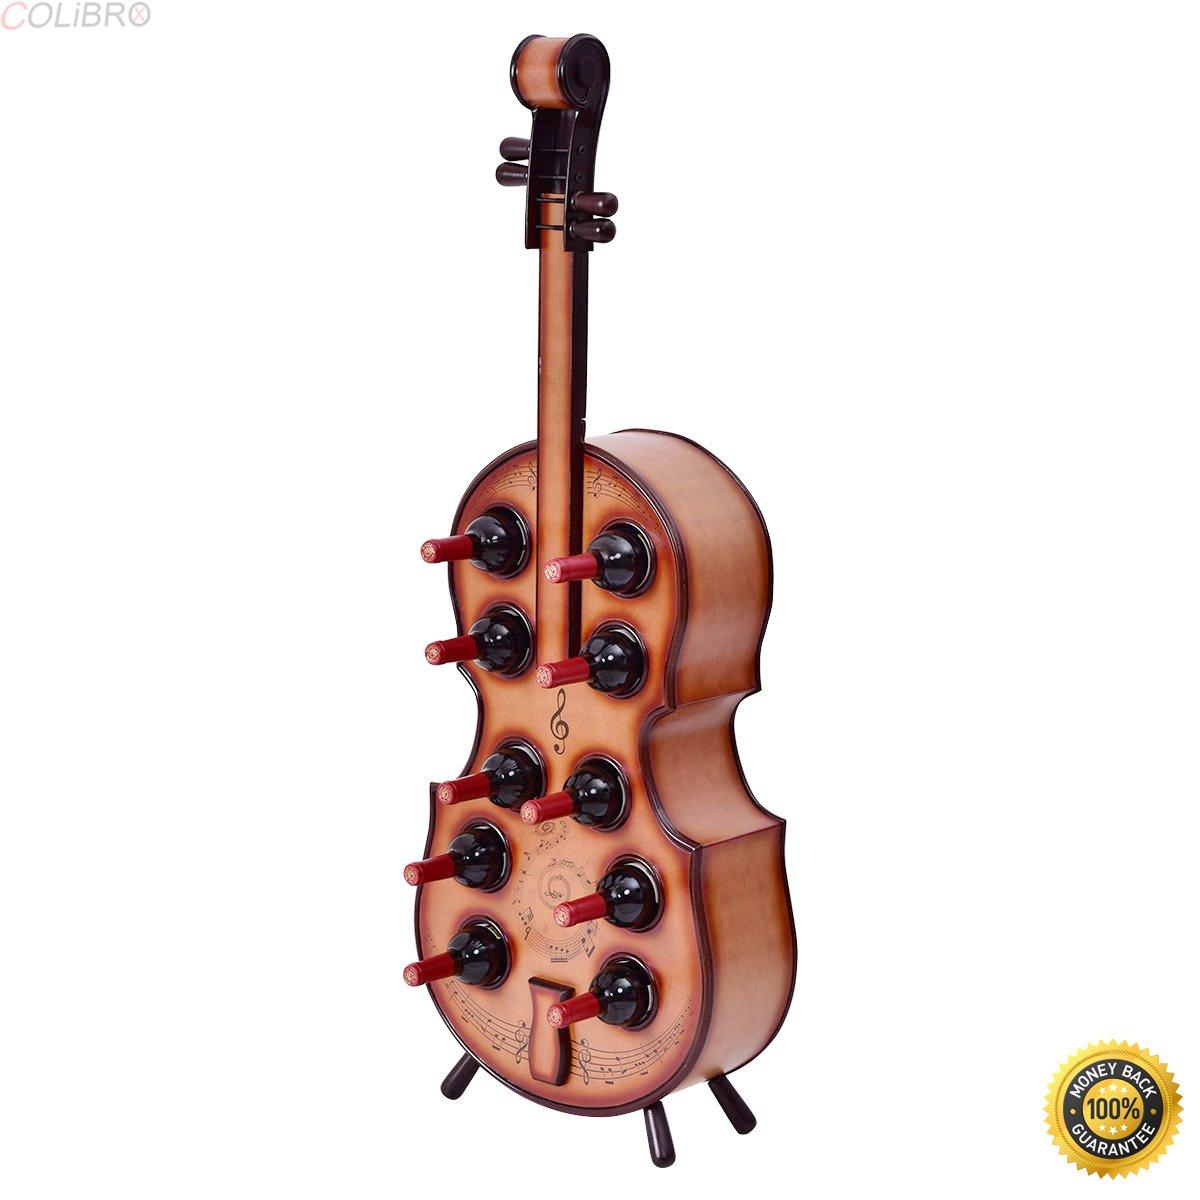 COLIBROX--10 Bottles Wood Wine Rack Violin Cello Bottle Holder 16th Century Liquor Shelf,cheap wine rack,new and Artistic wine rack,Wine Rack Wood Storage